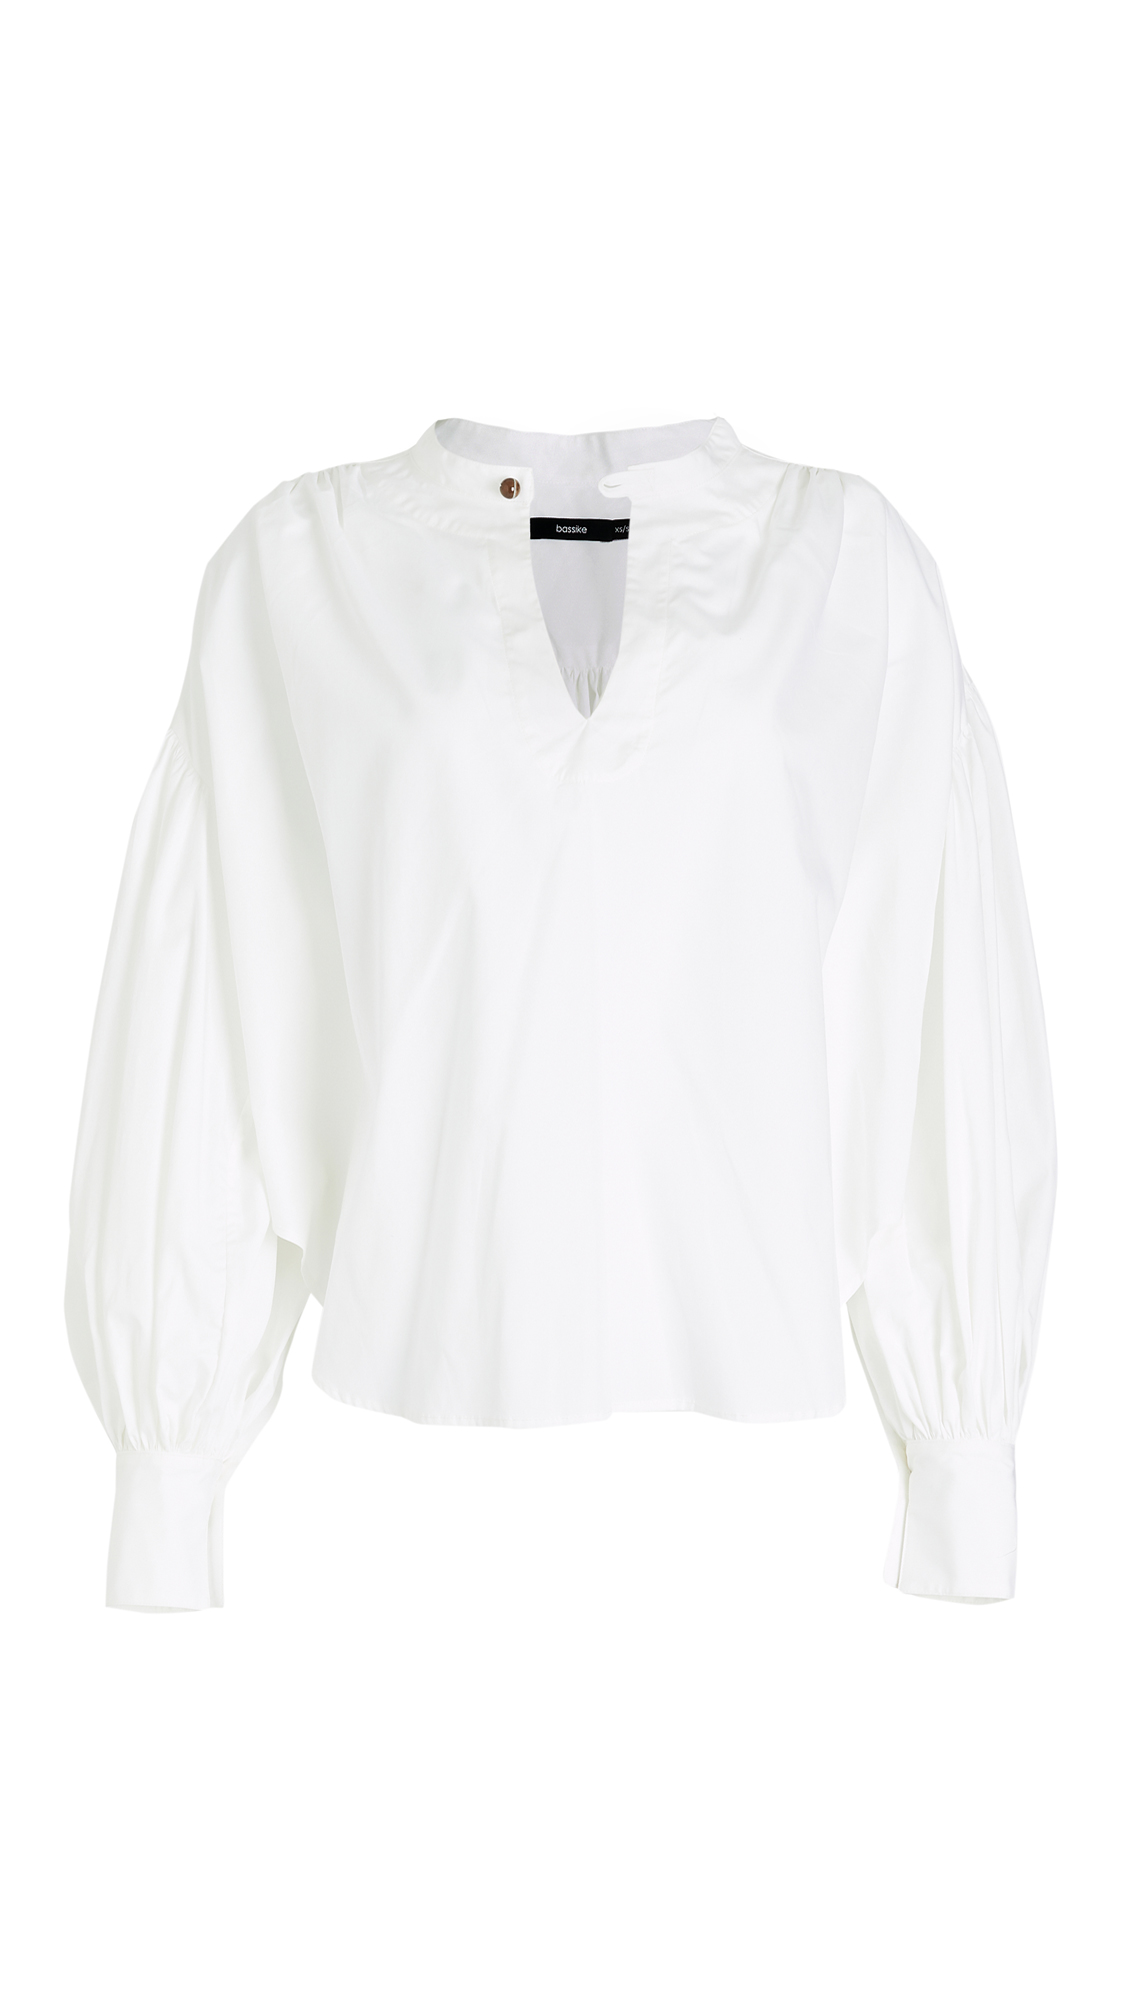 Bassike Cotton Gathered Ovrsized Shirt